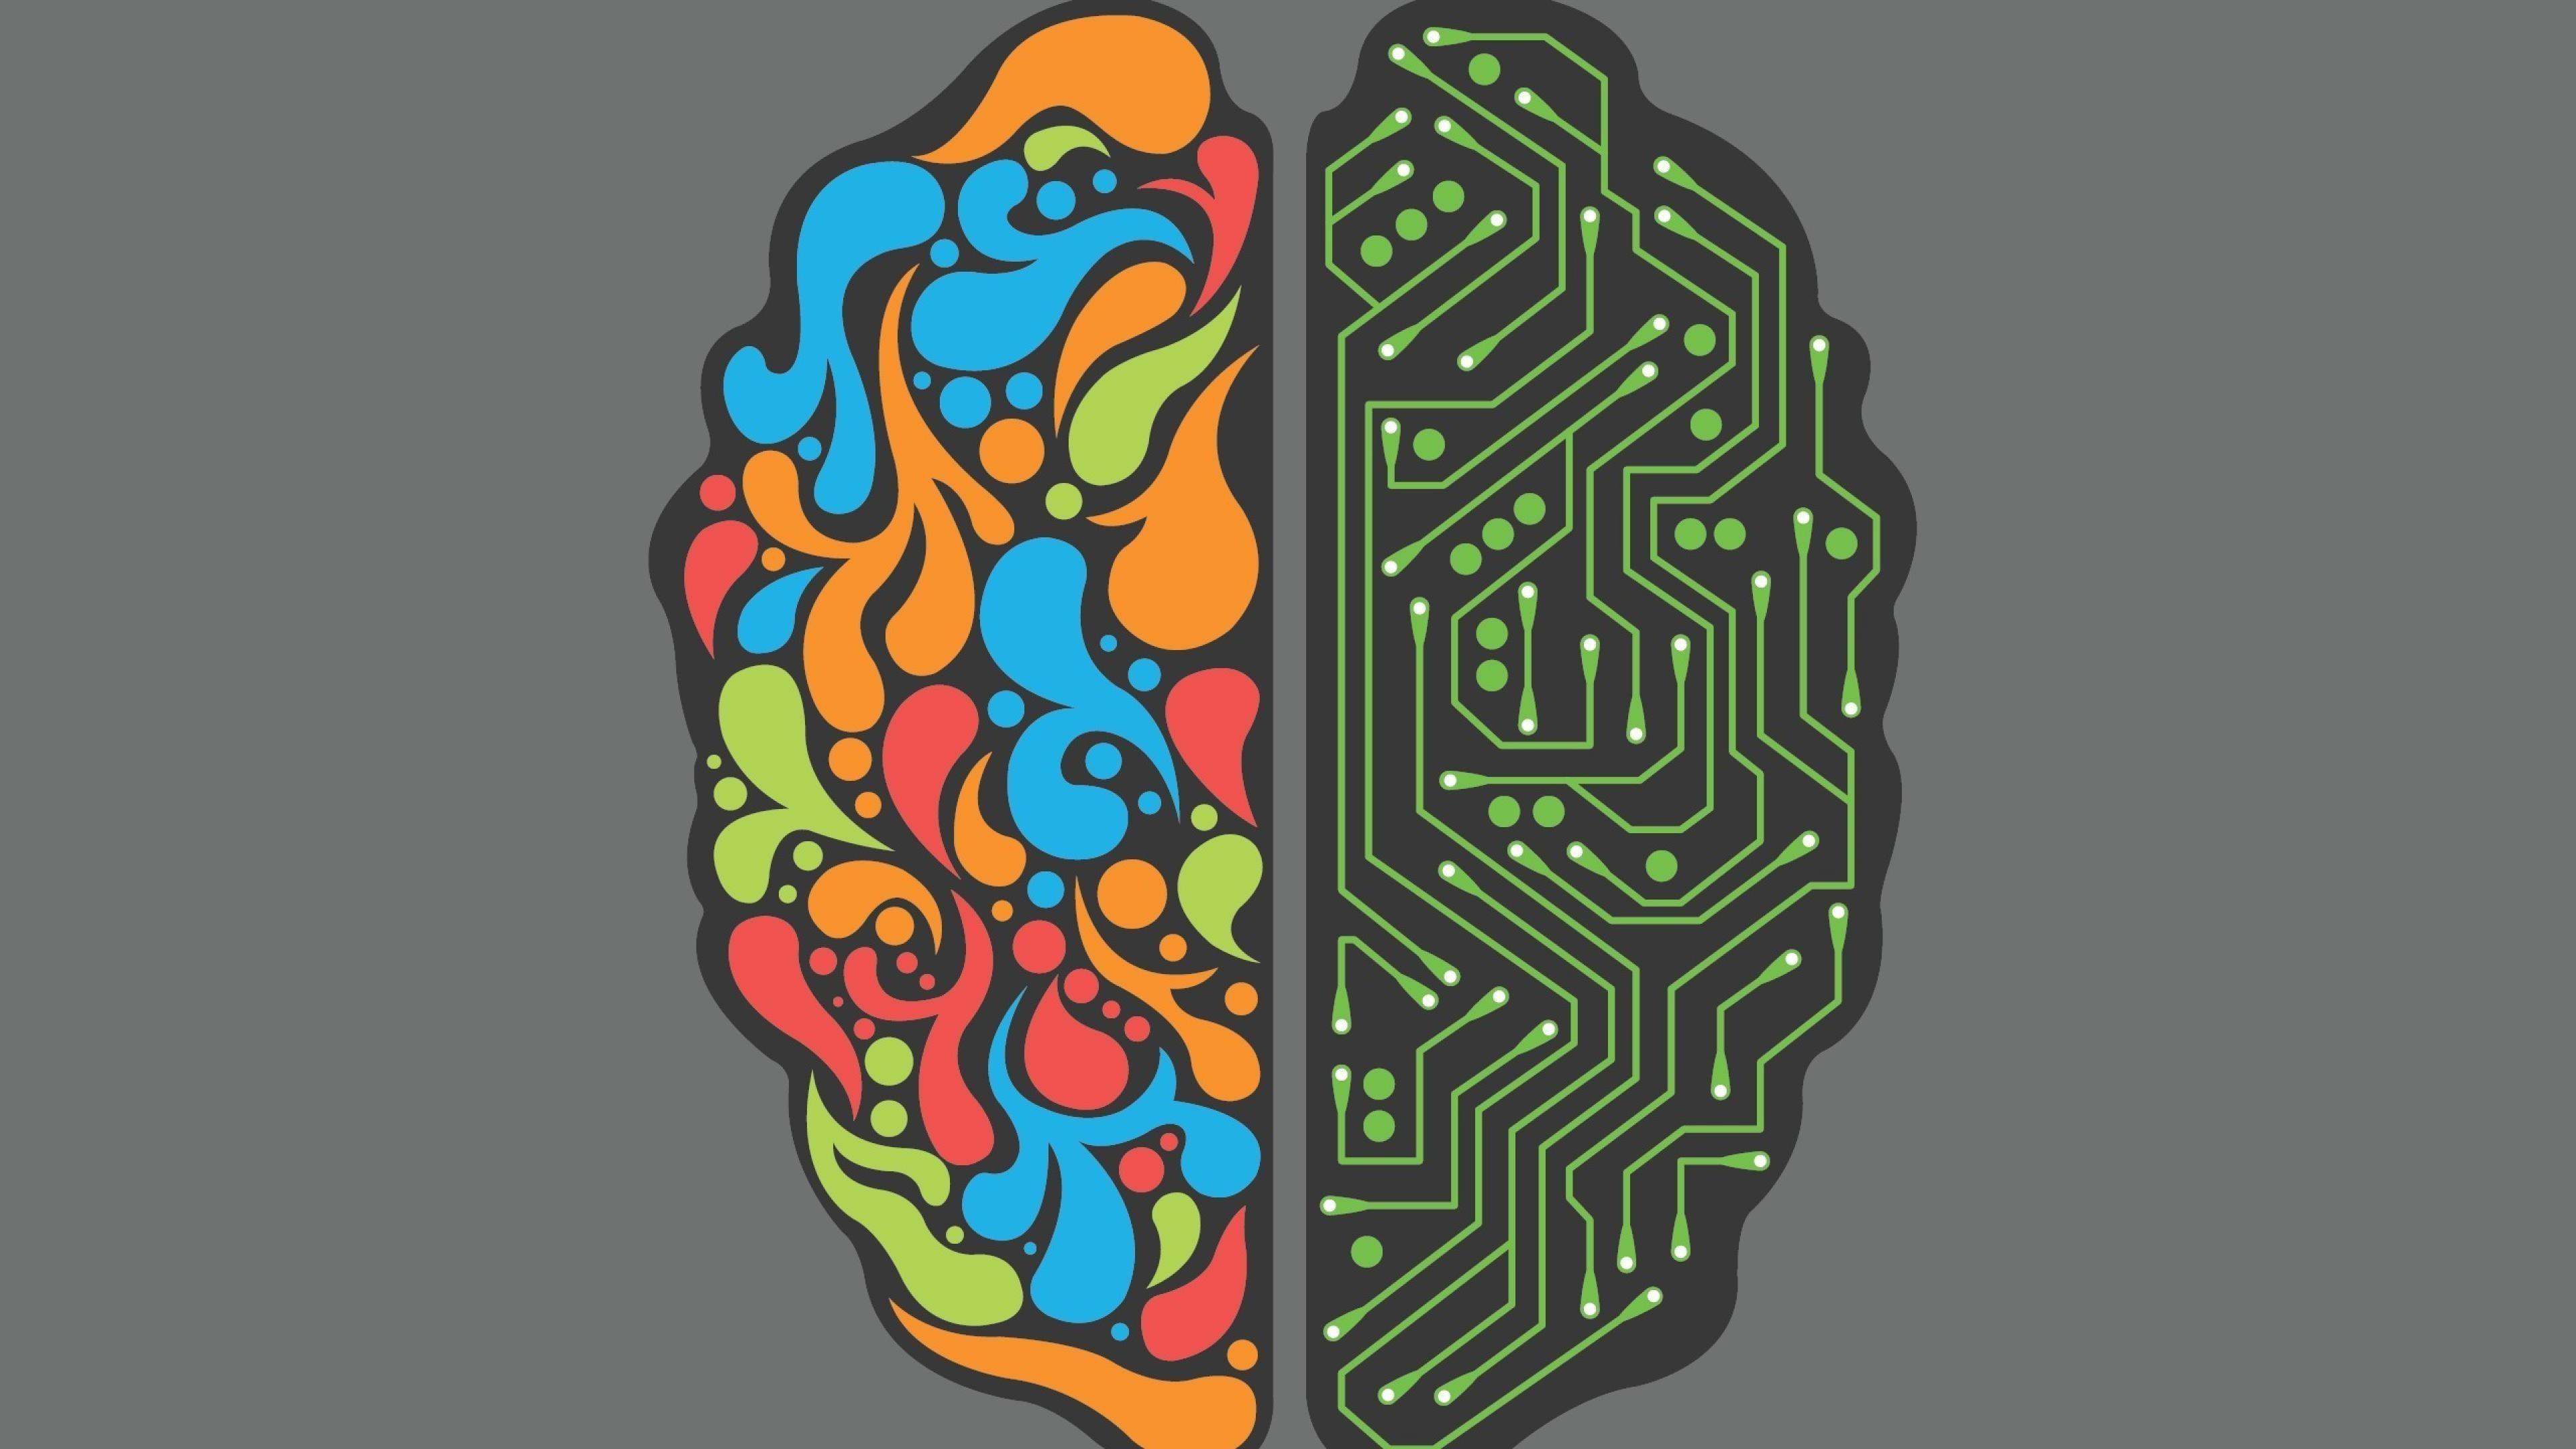 brain minimalism 4k 1540748489 - Brain Minimalism 4k - minimalism wallpapers, digital art wallpapers, brain wallpapers, artist wallpapers